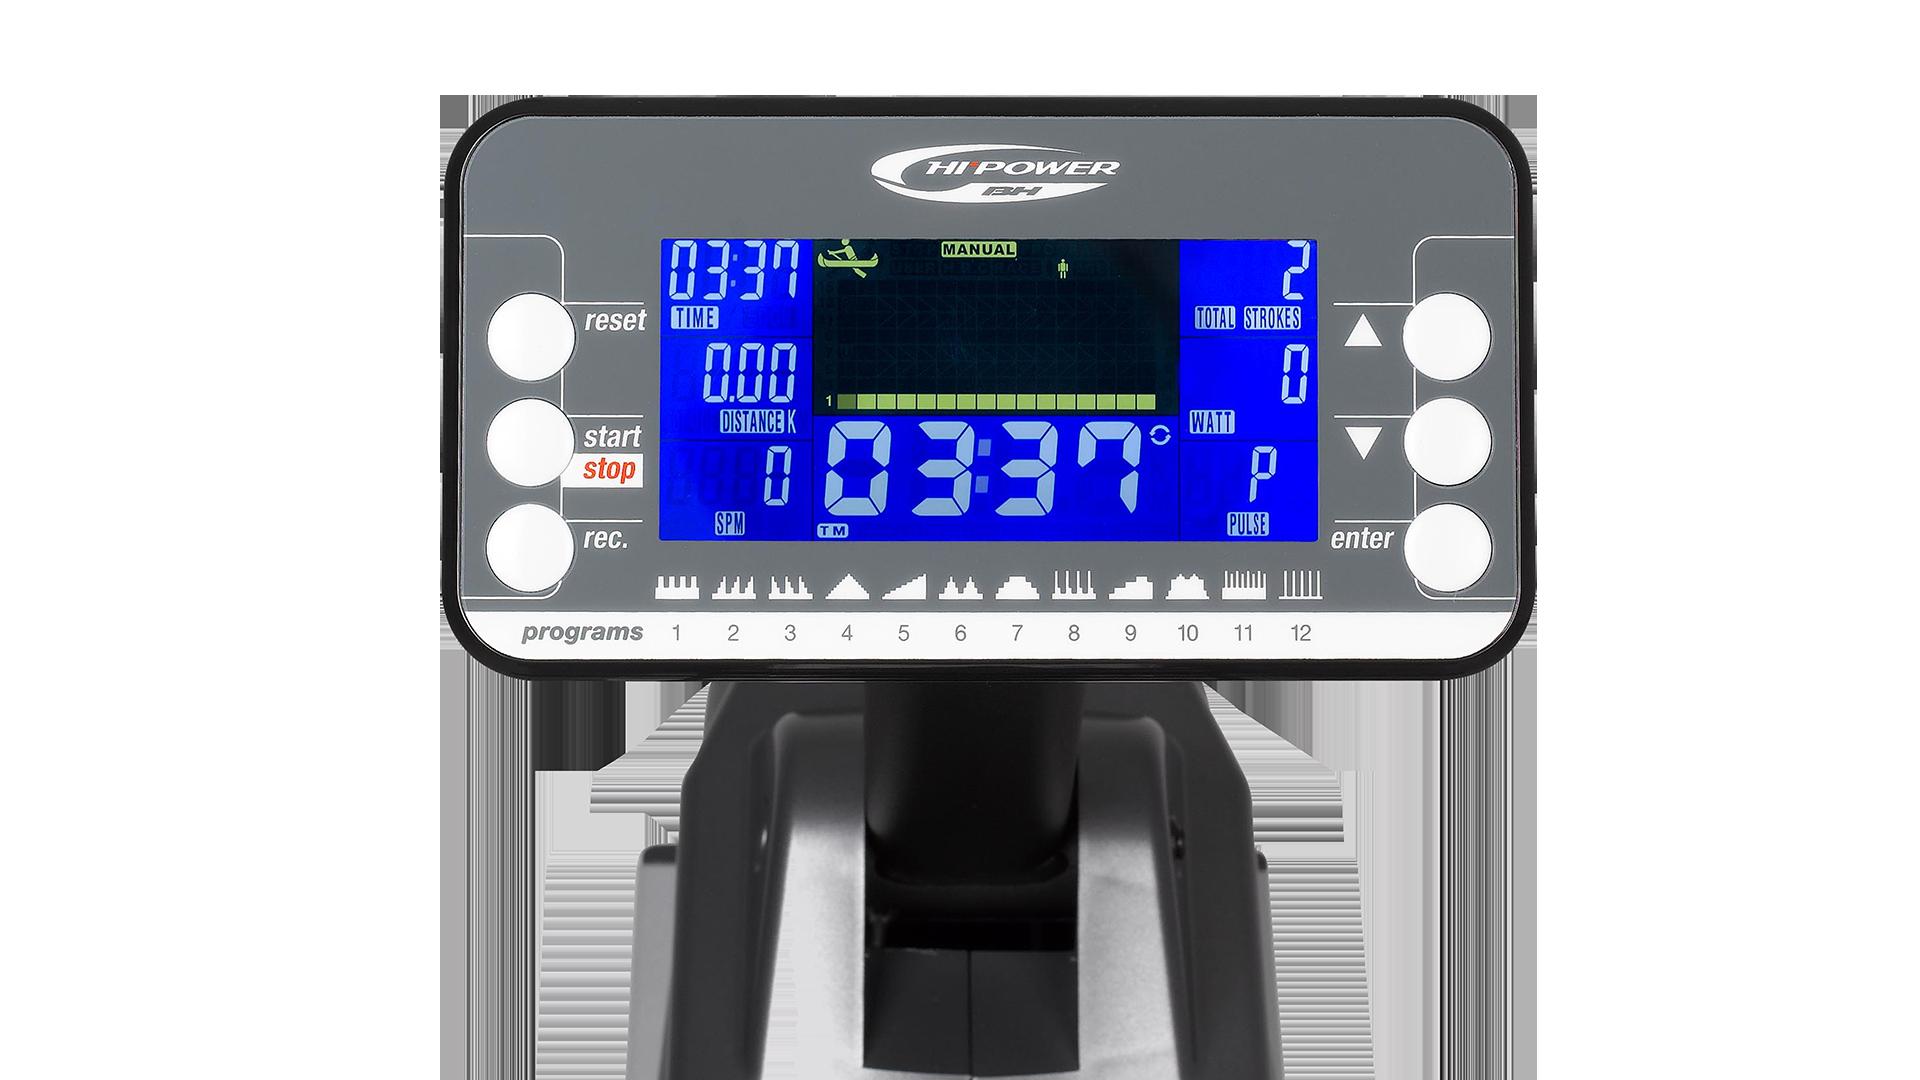 LK5000 Professional rowing